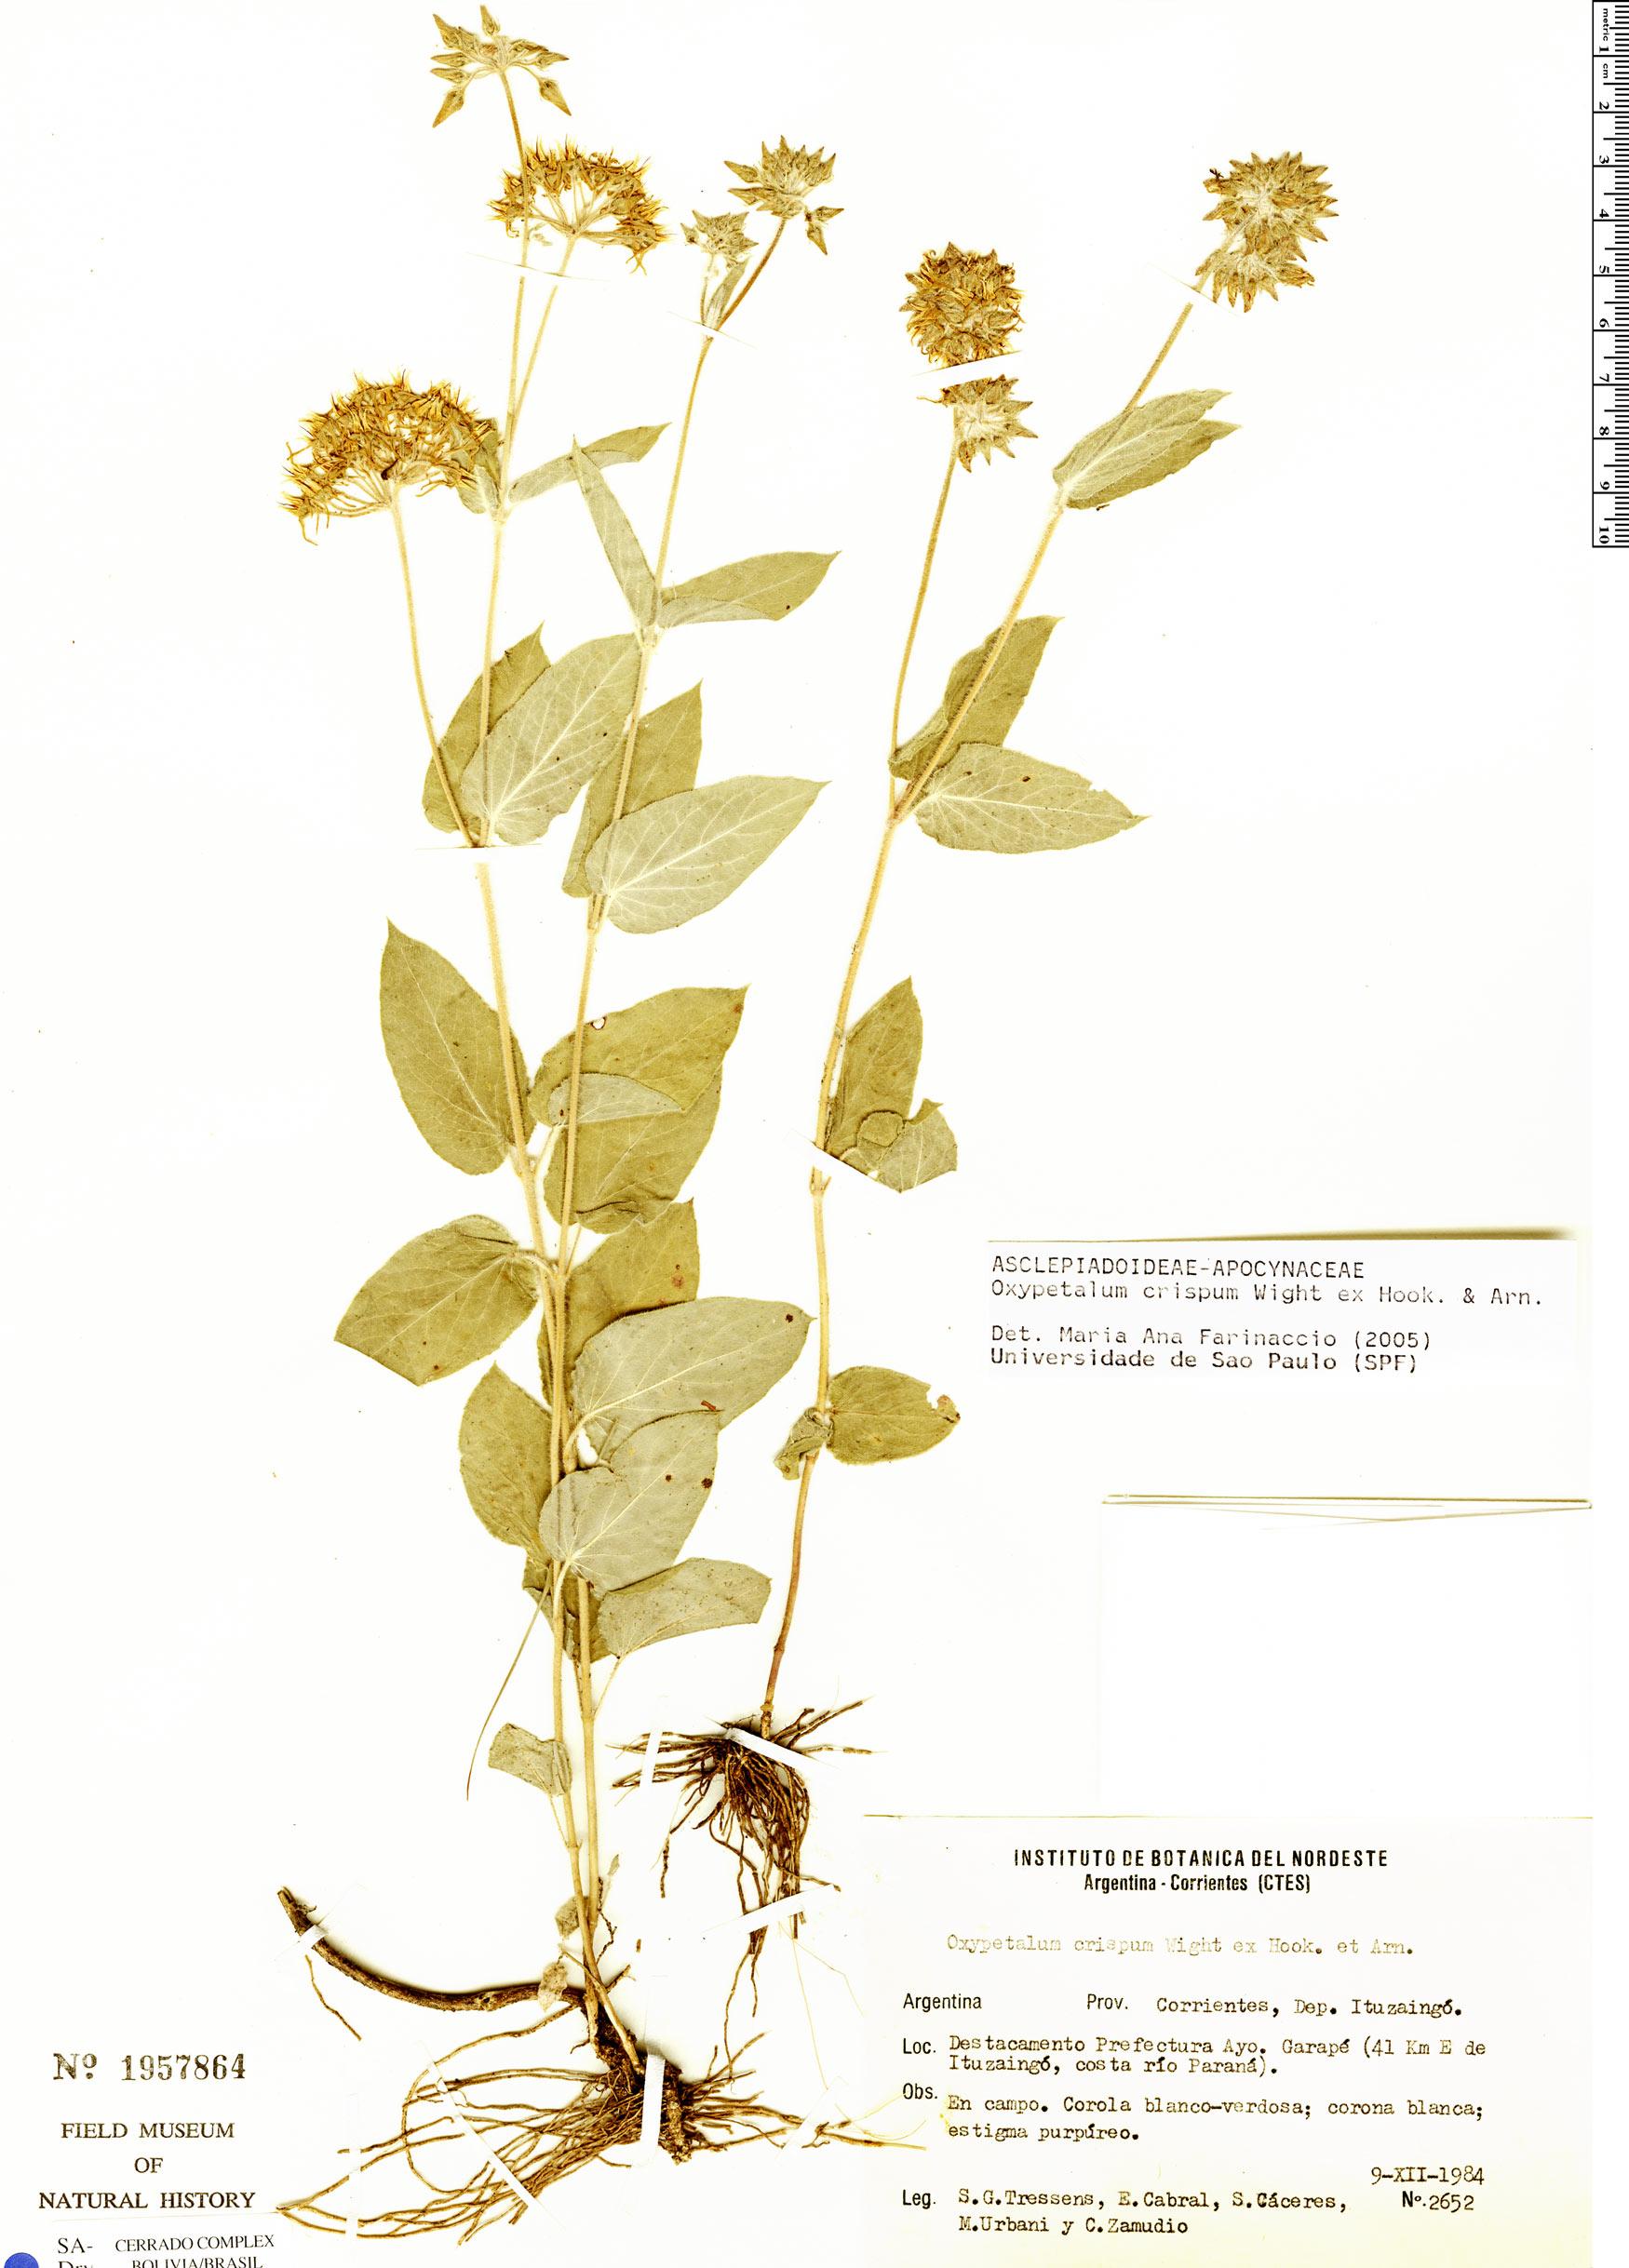 Specimen: Oxypetalum crispum